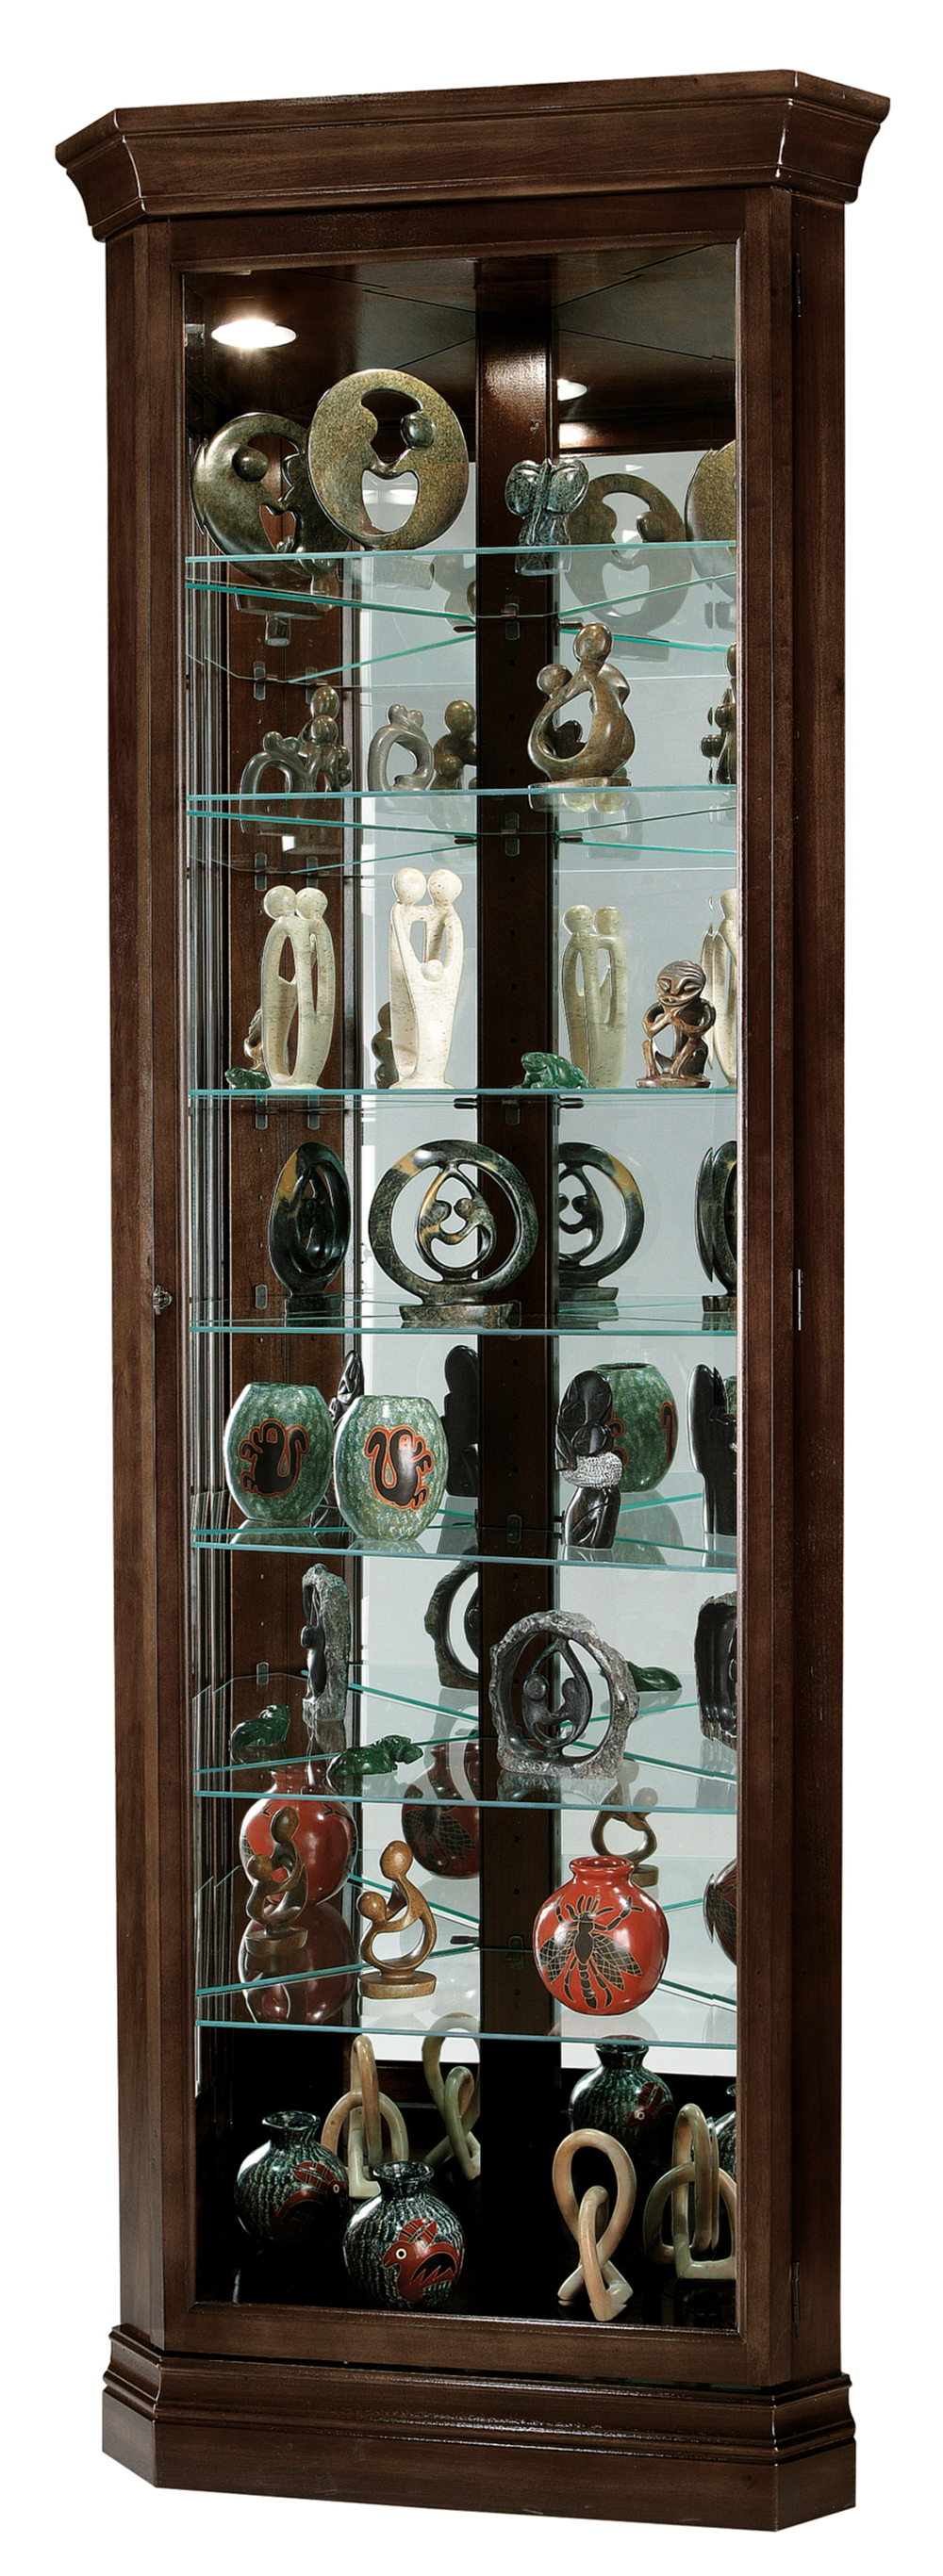 Howard Miller Clock - Dustin Curio Cabinet